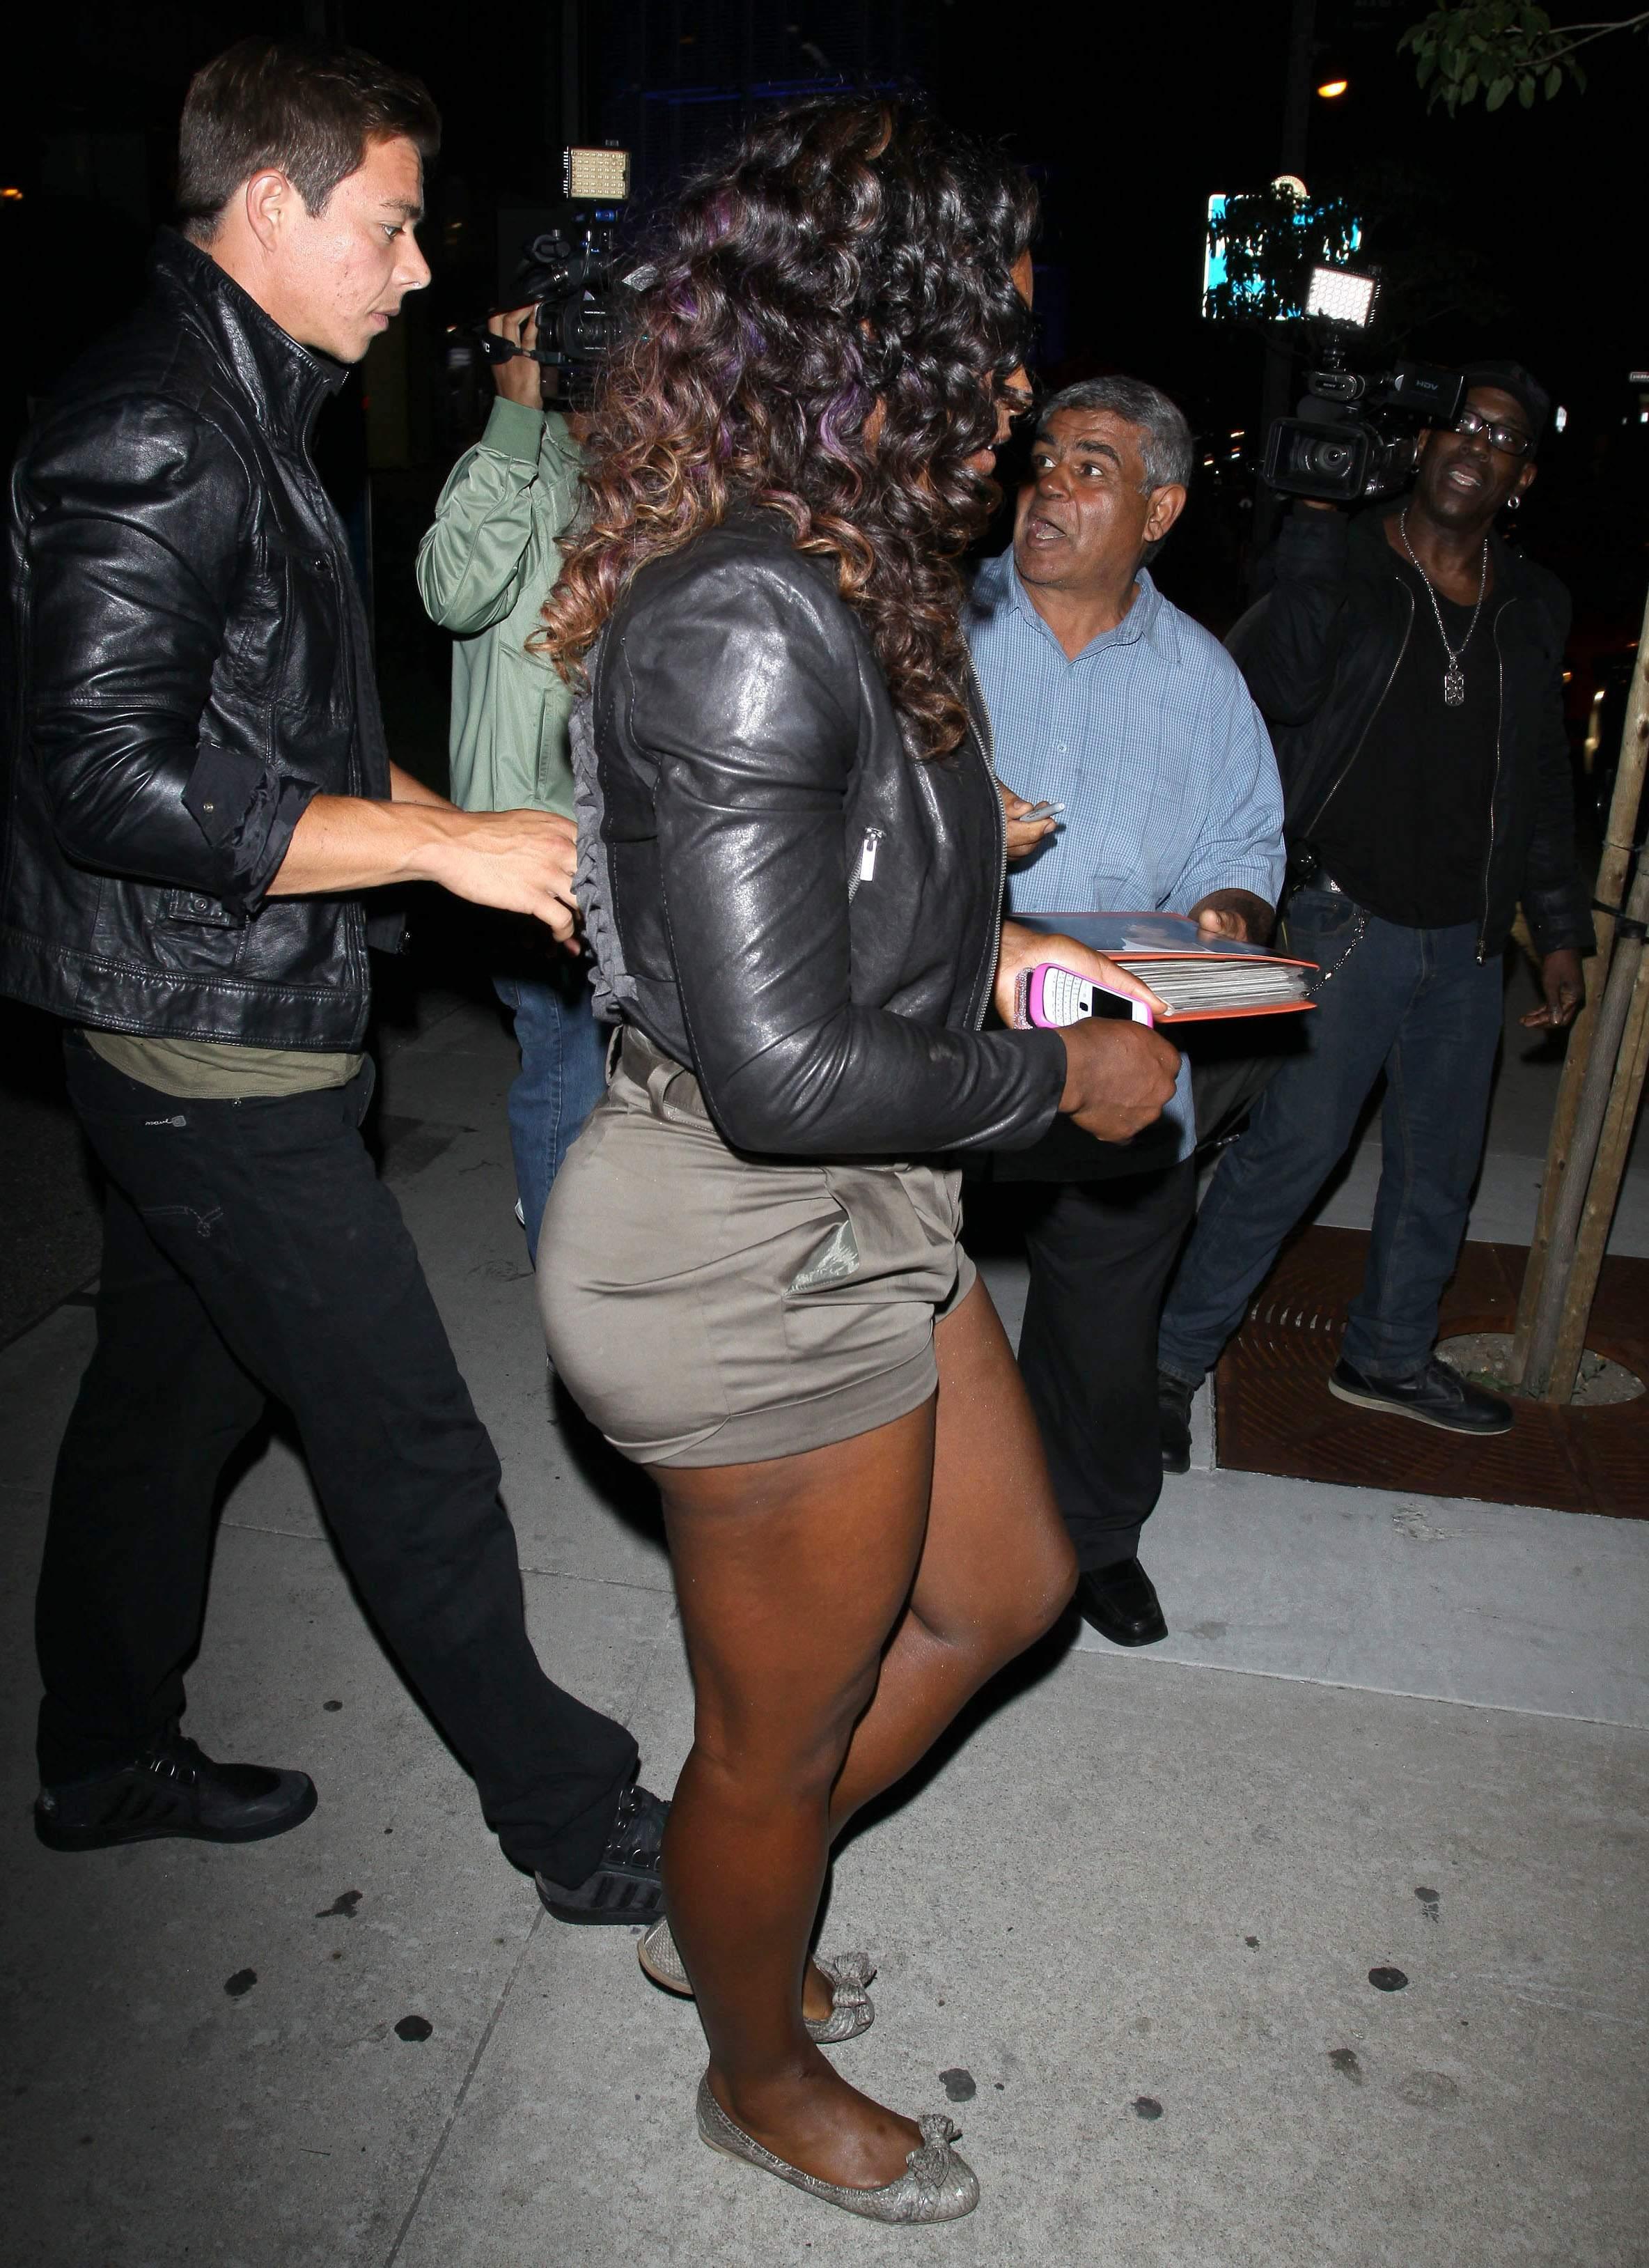 Serena Williams BoaSteakhouseJuly13201115_123_94lo.jpg